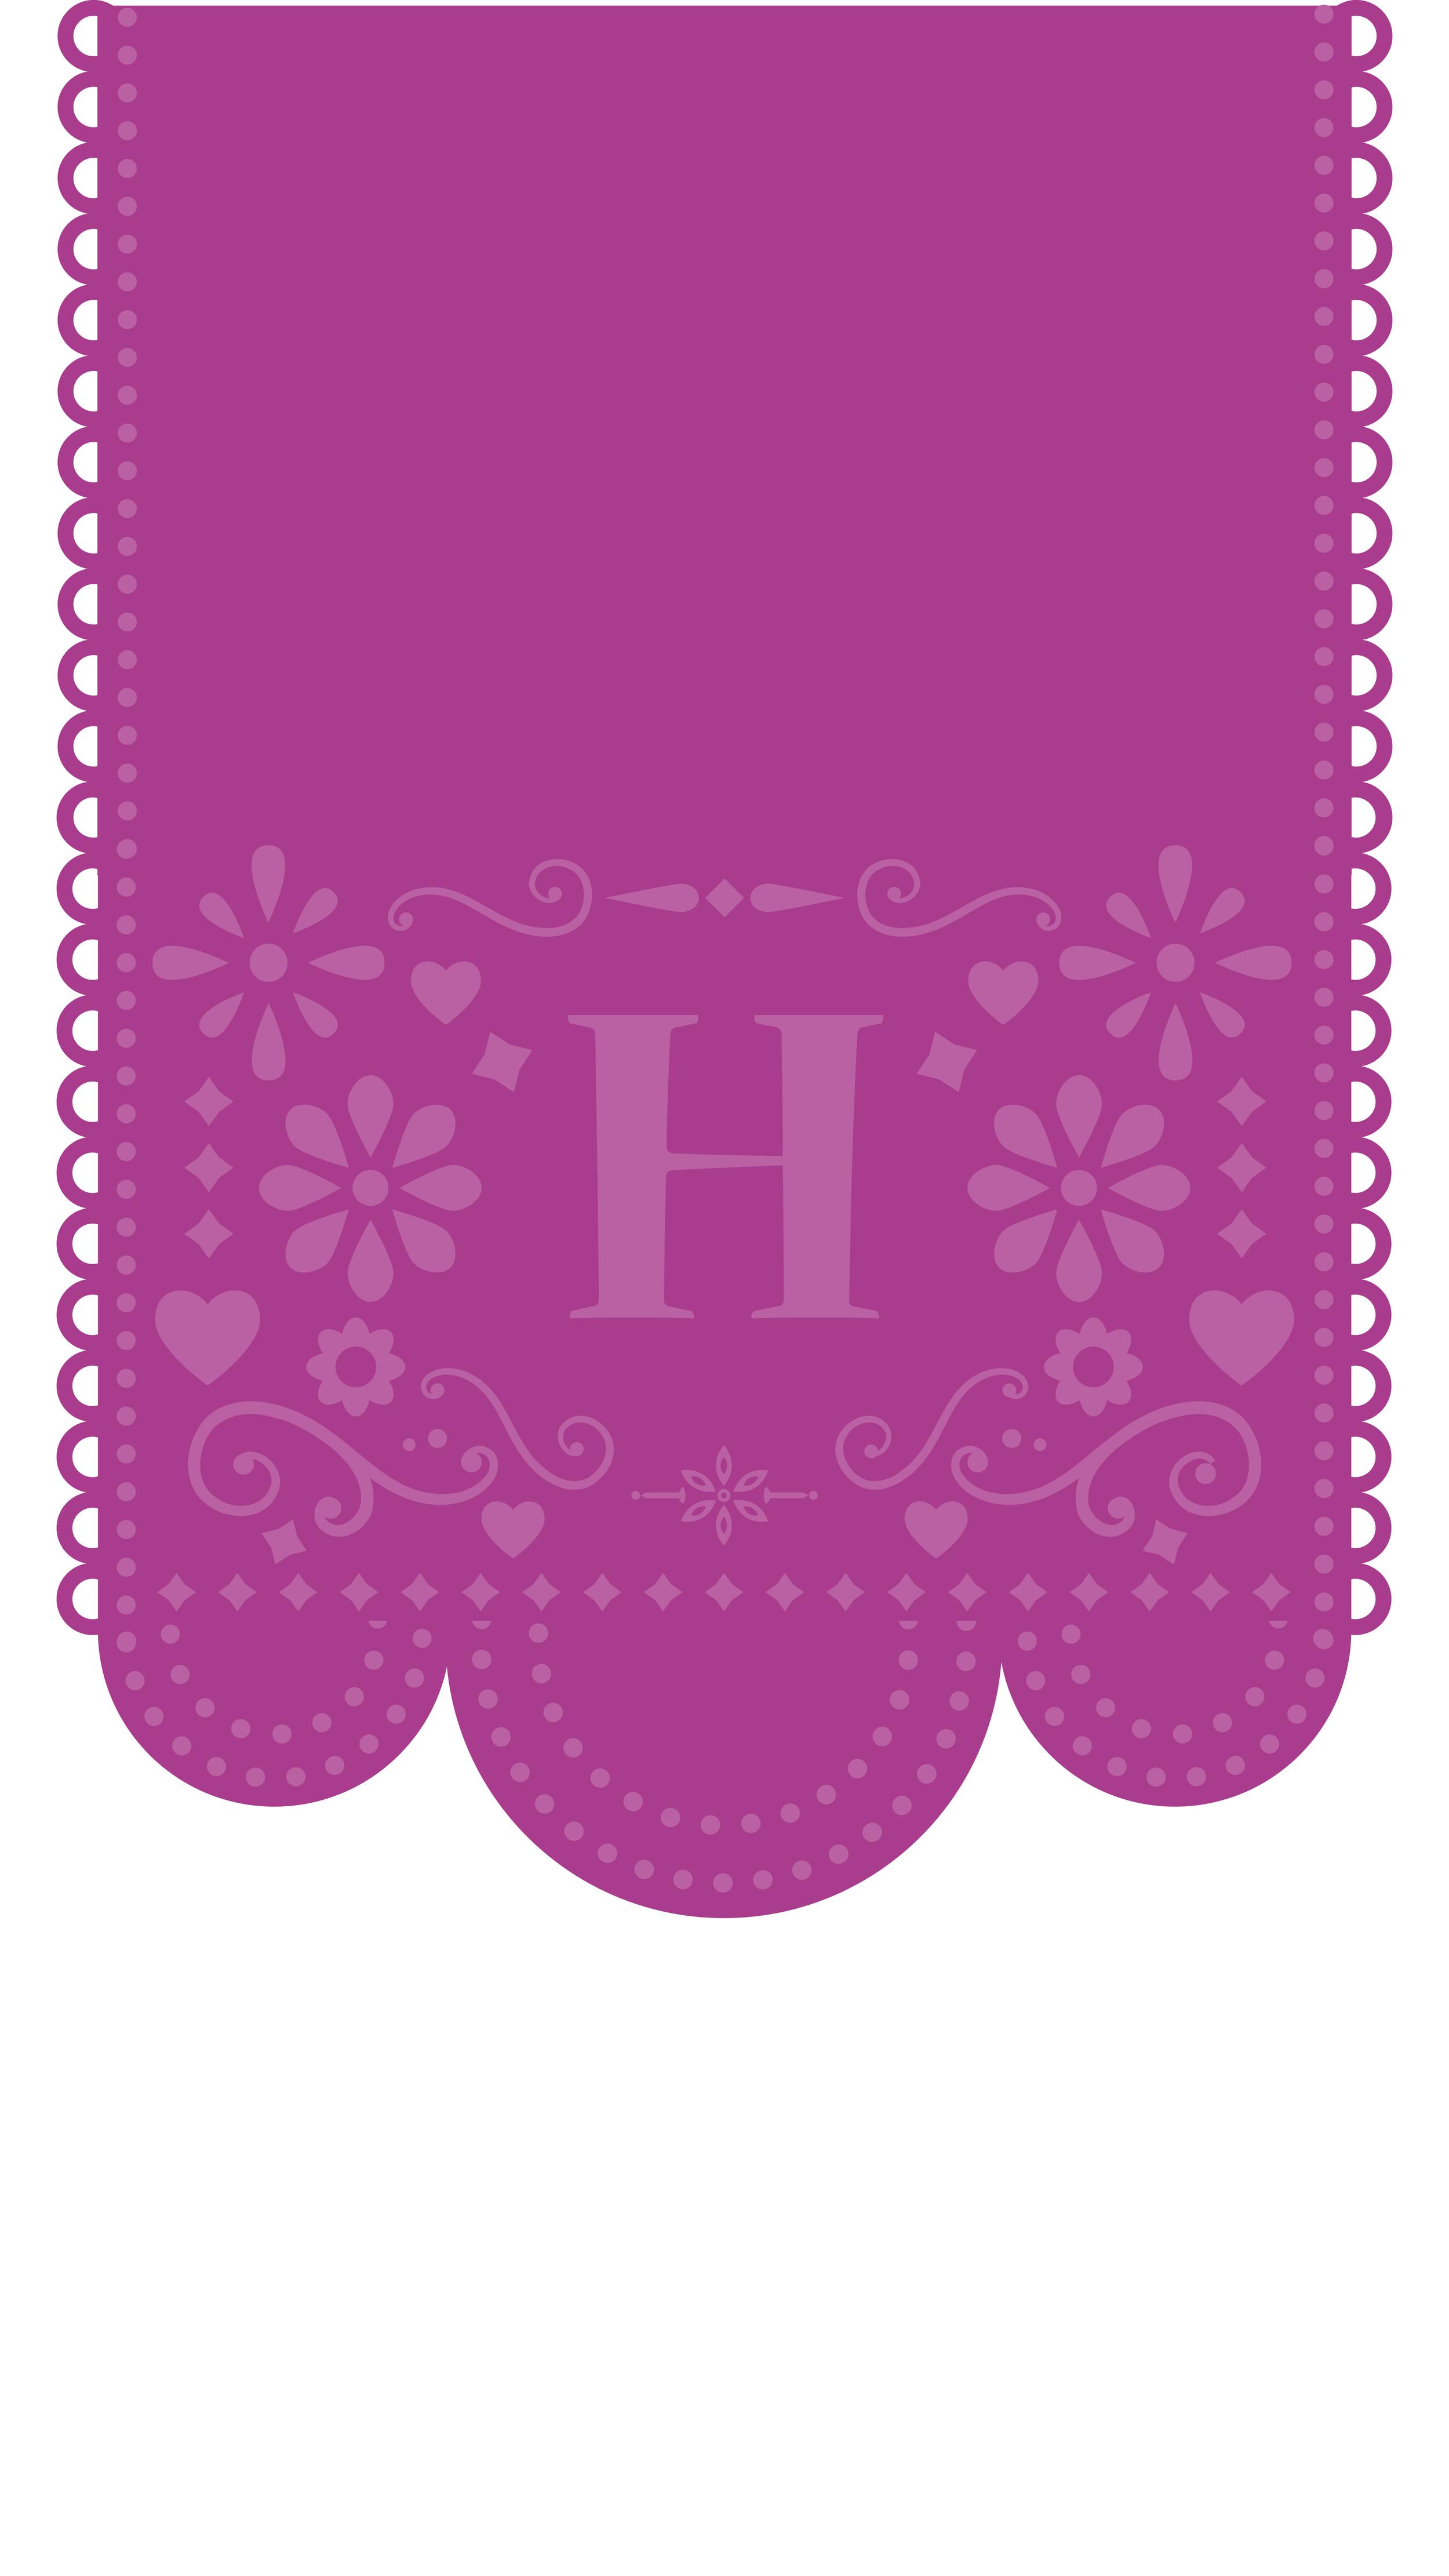 h-fiesta-banner.png